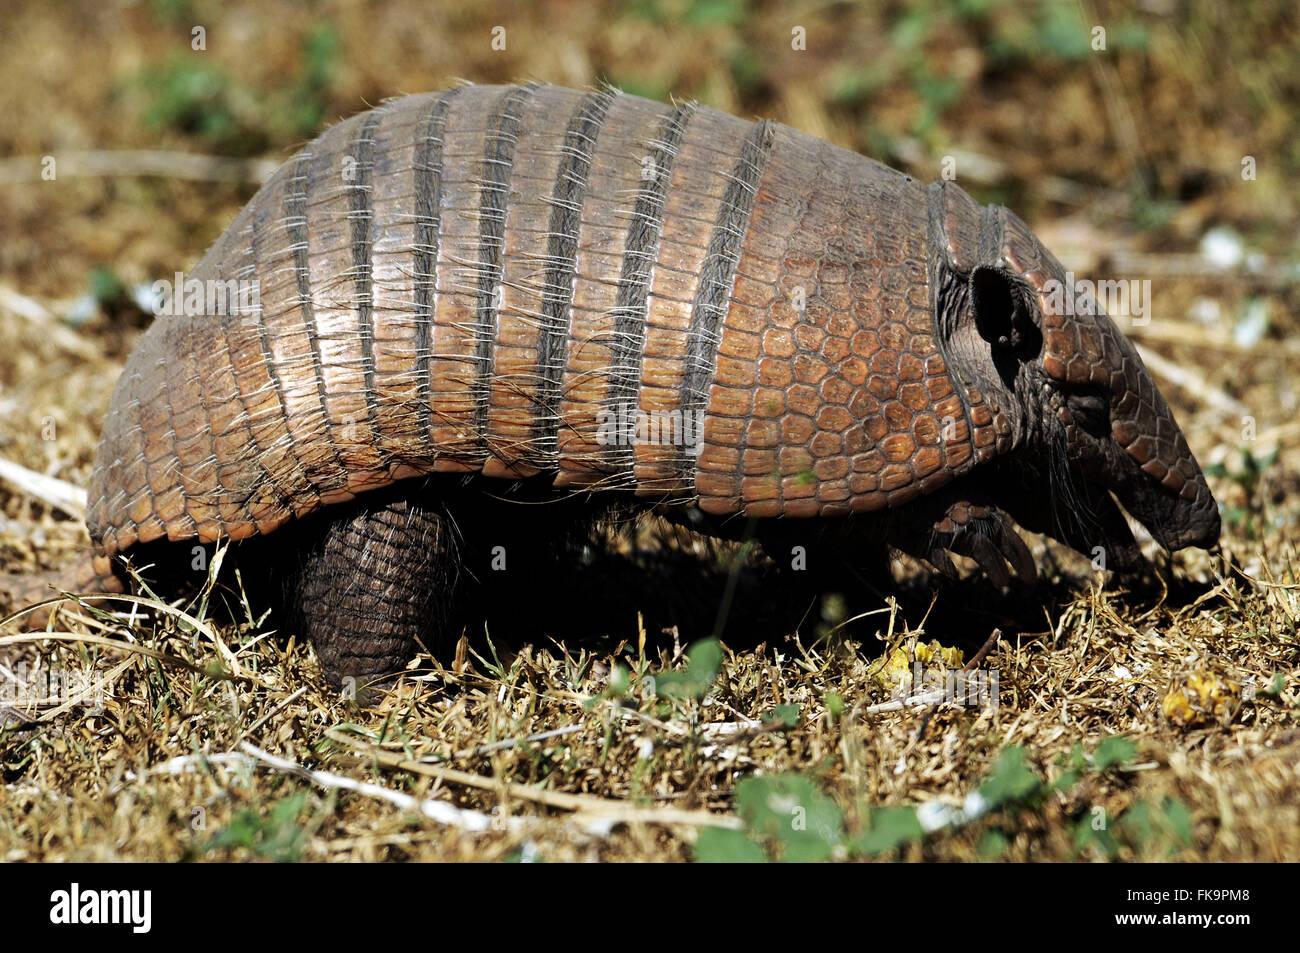 Tatu-peba el Pantanal - Euphractus sexcintus Imagen De Stock